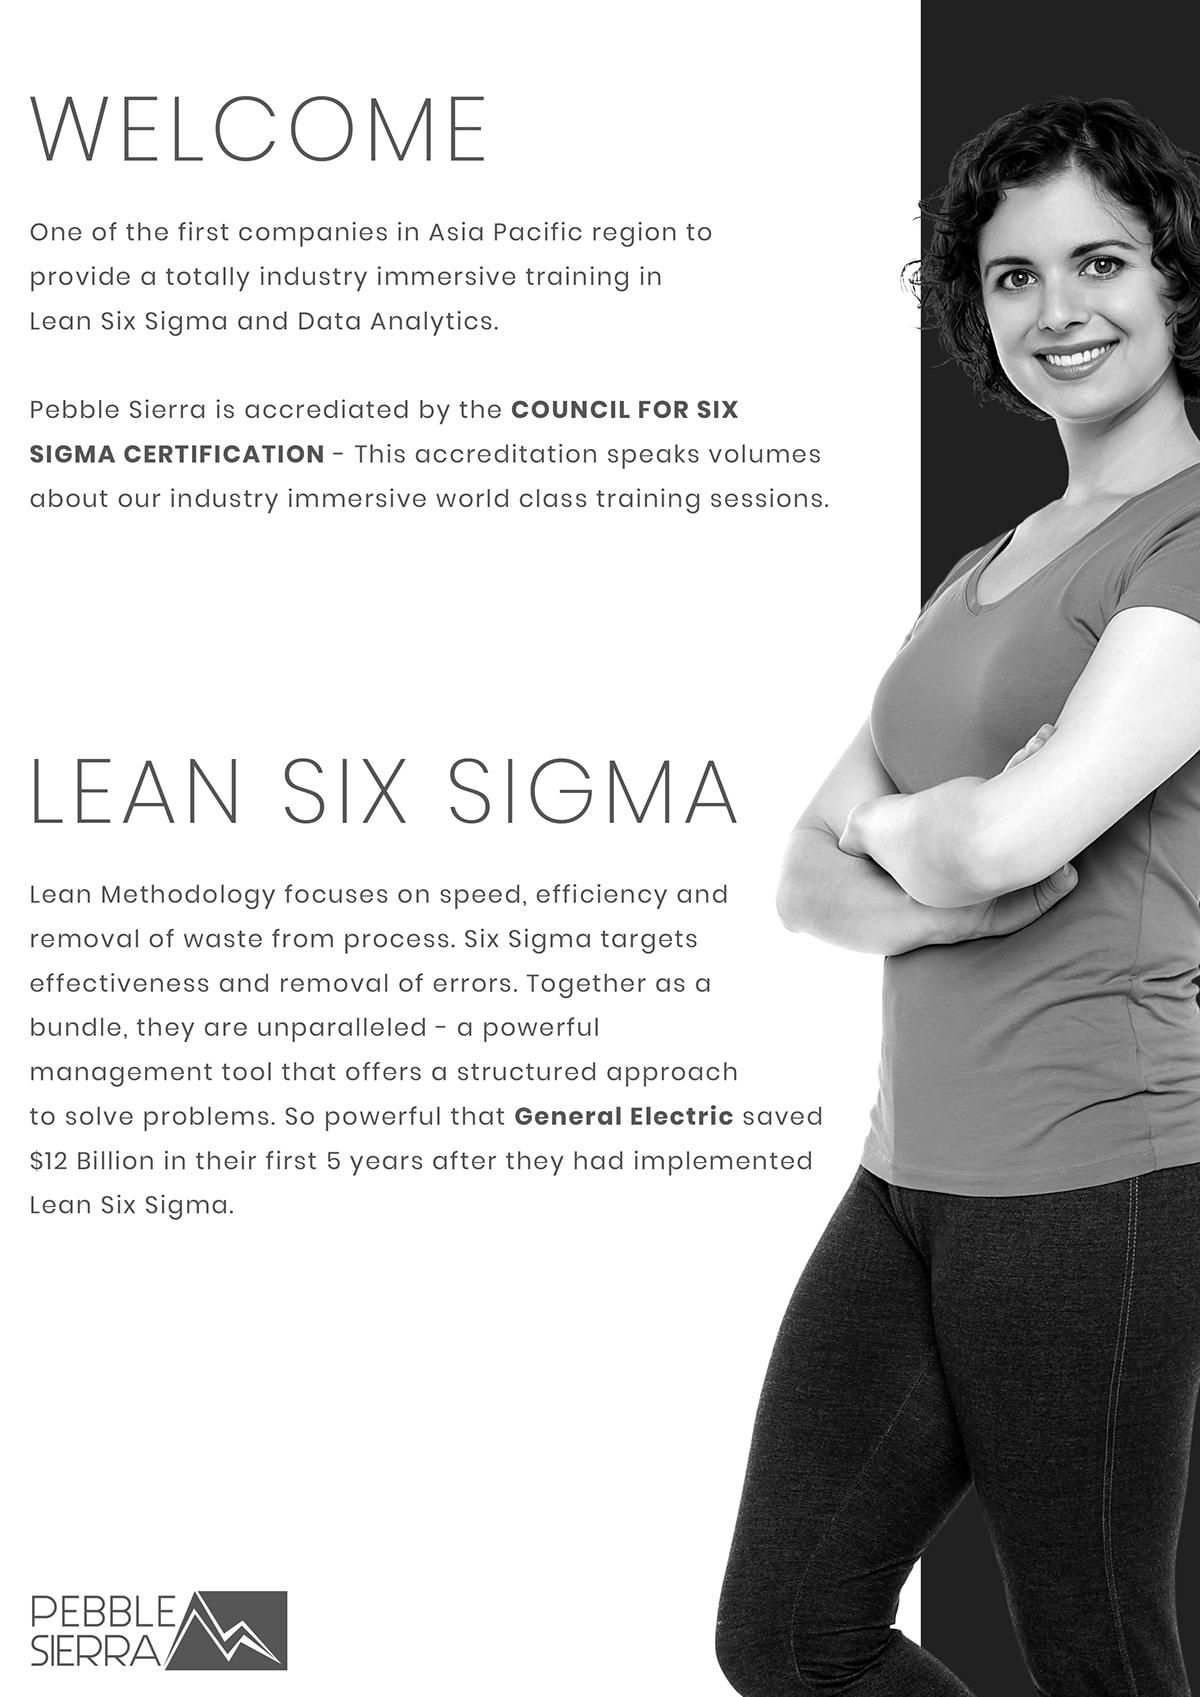 Brochure Design For Pebble Sierra Lean Six Sigma On Behance